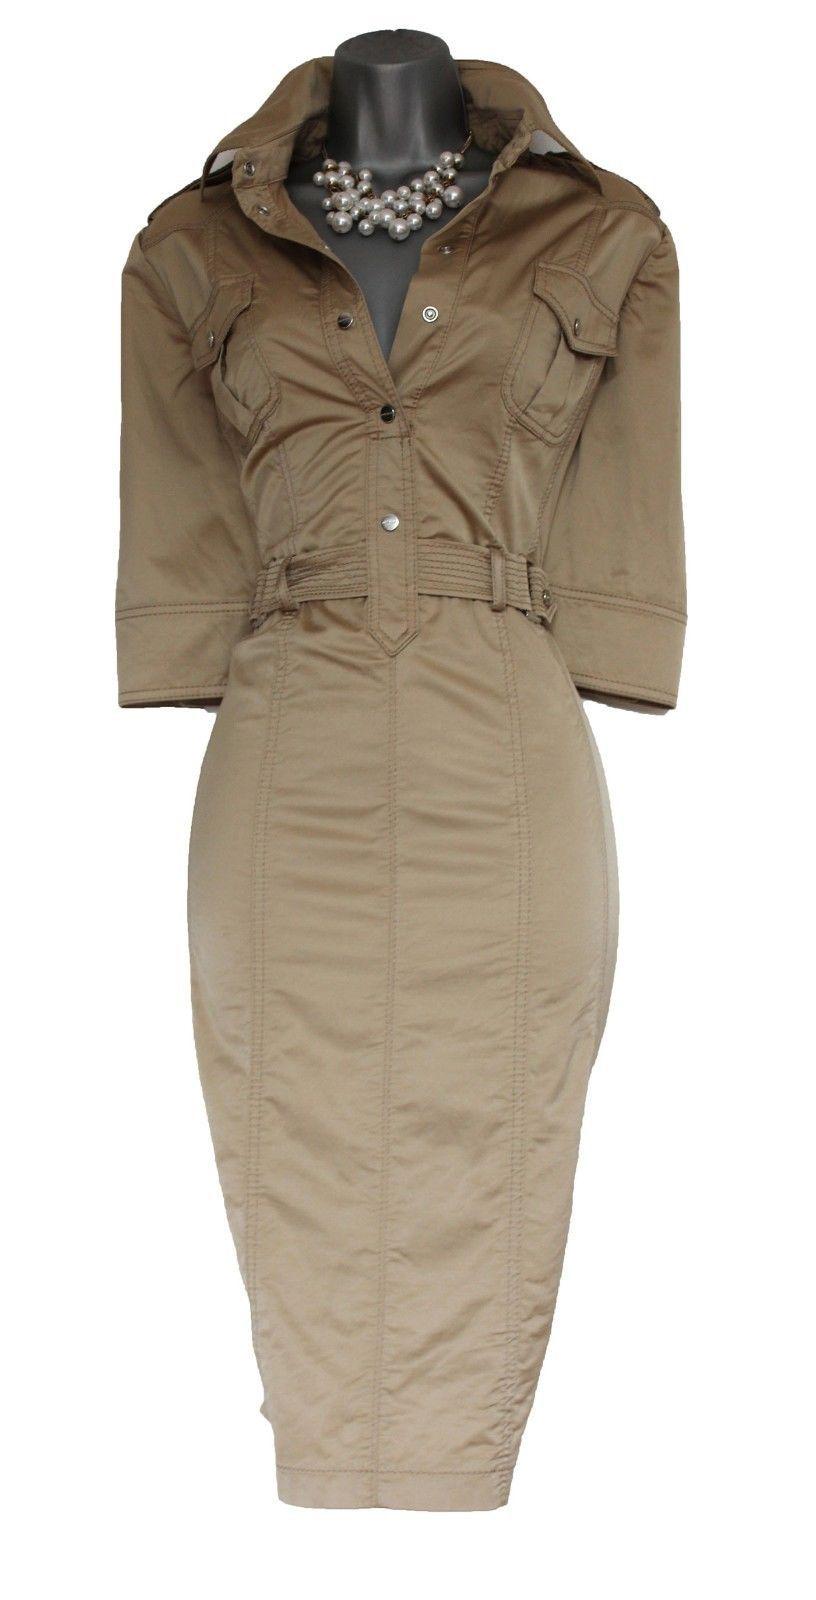 Safari style dress uk